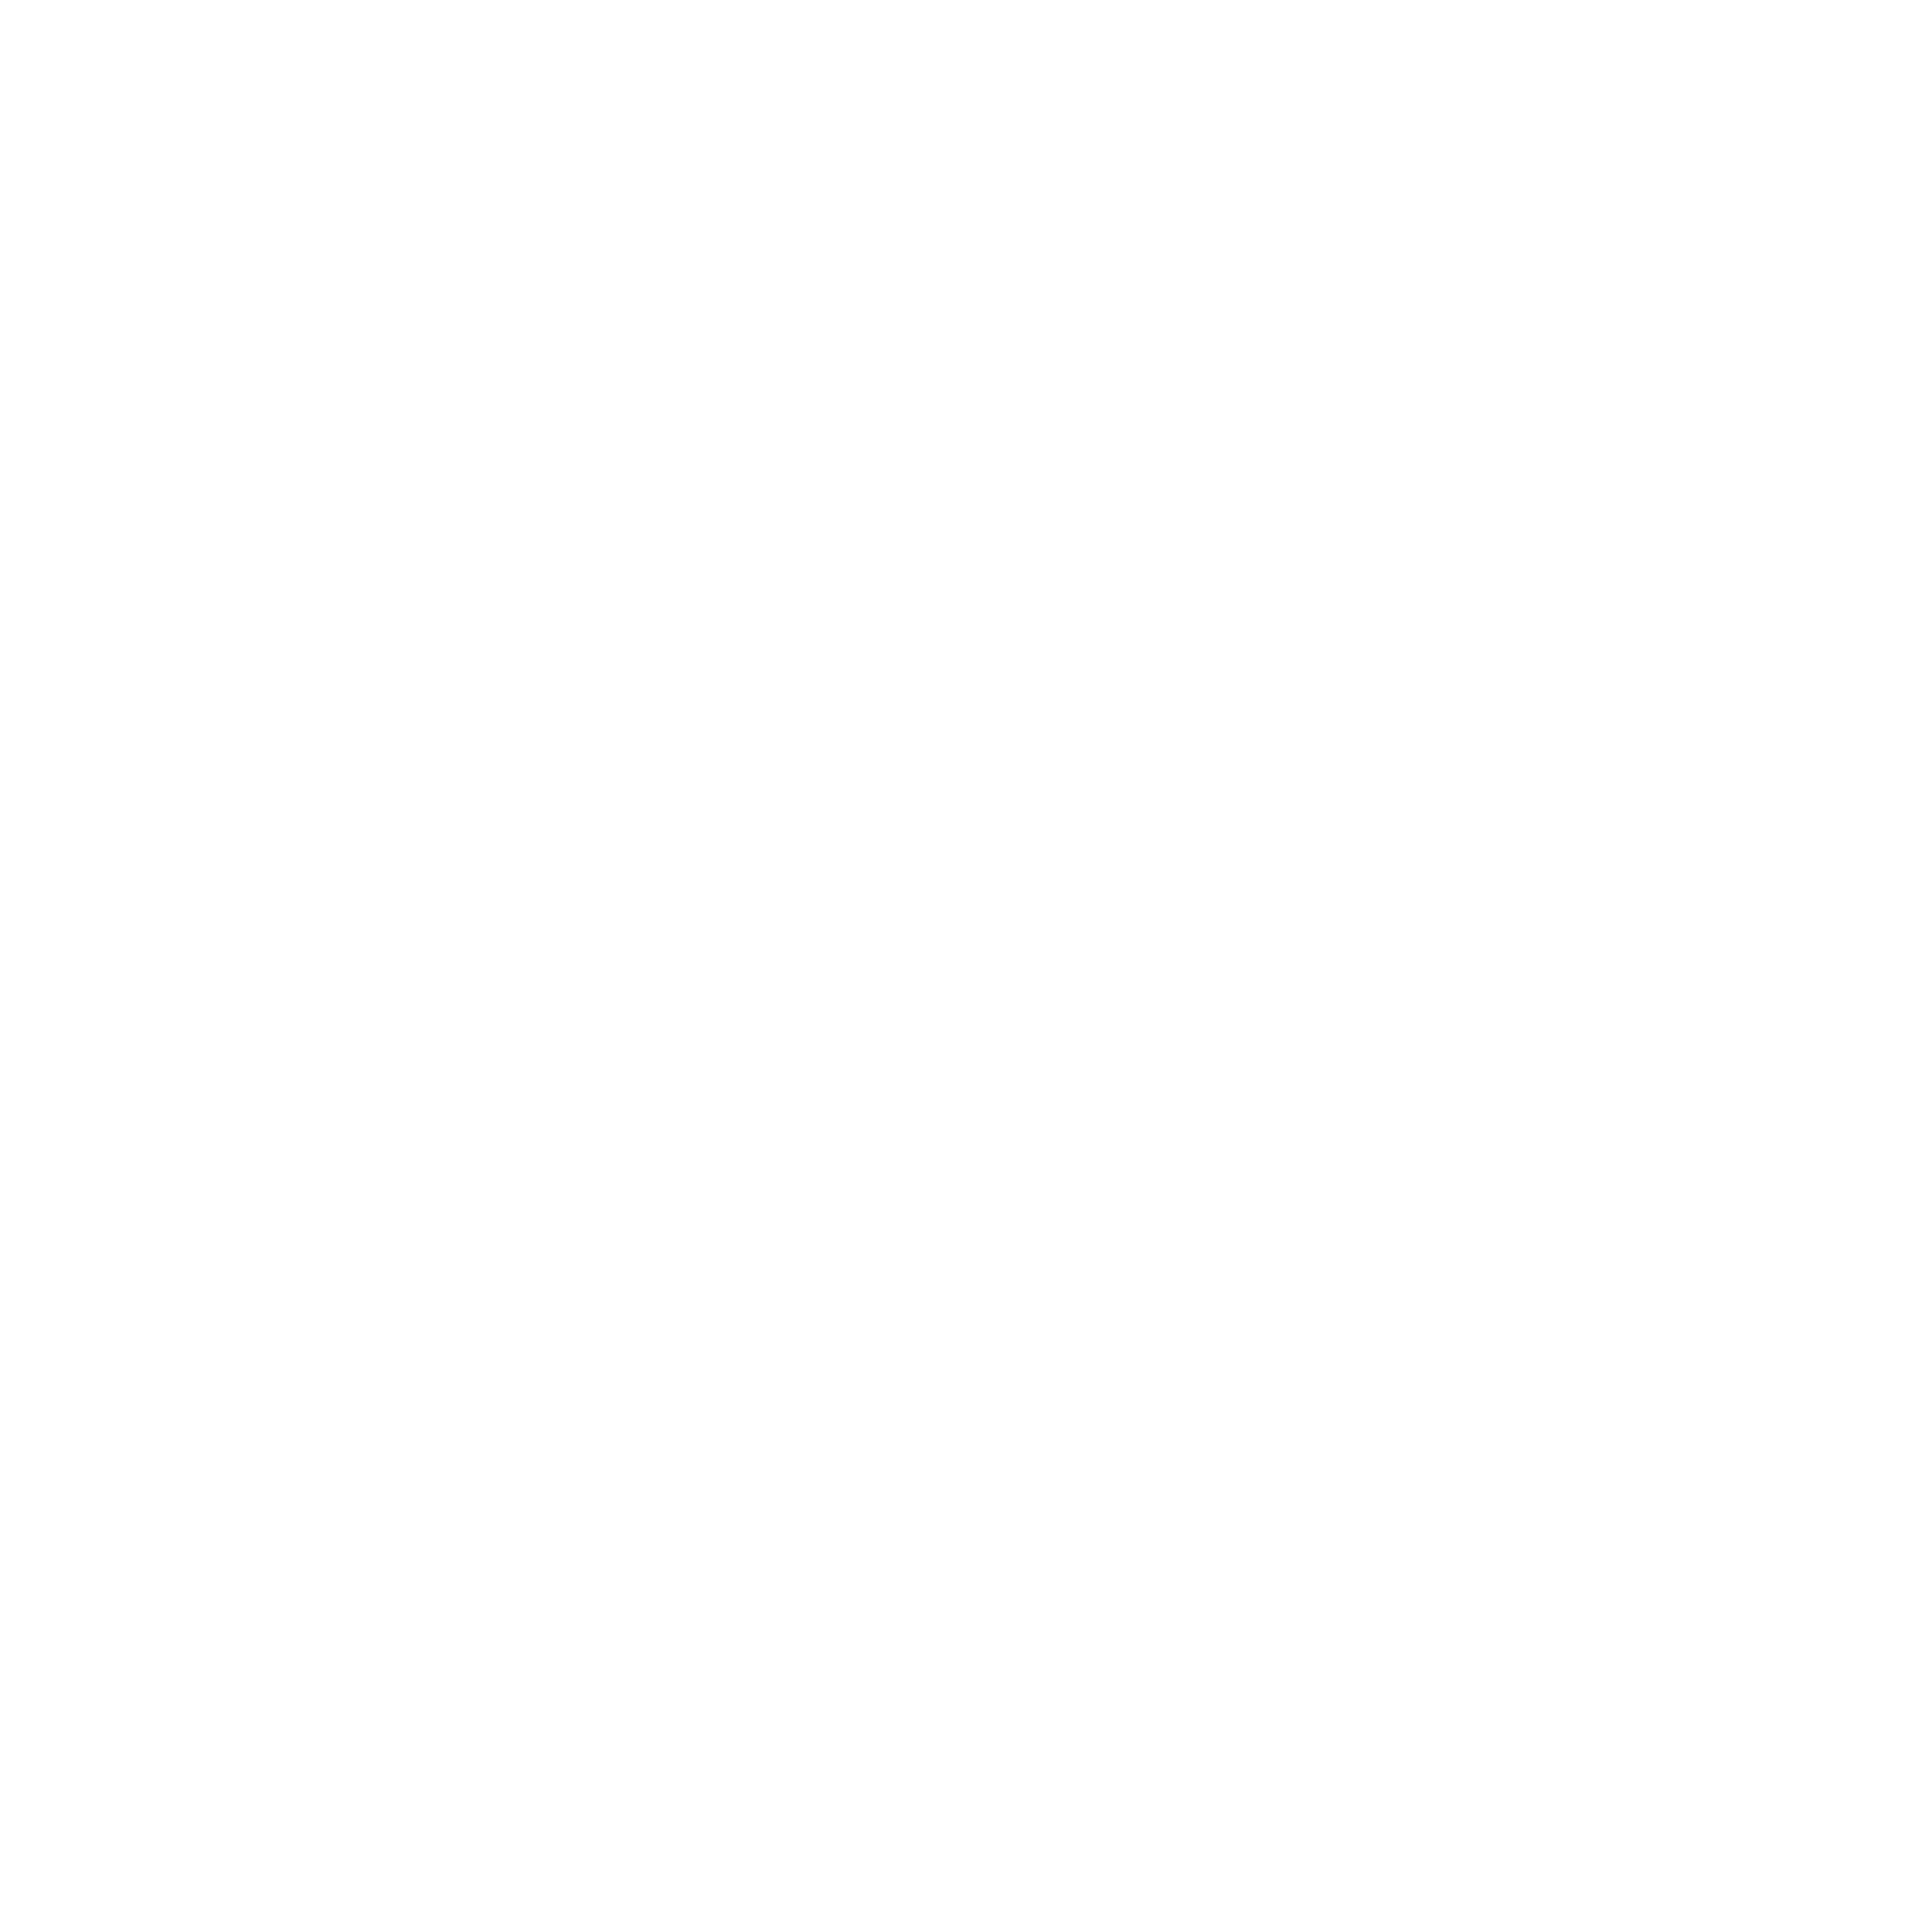 S&S Woodcraft logo white